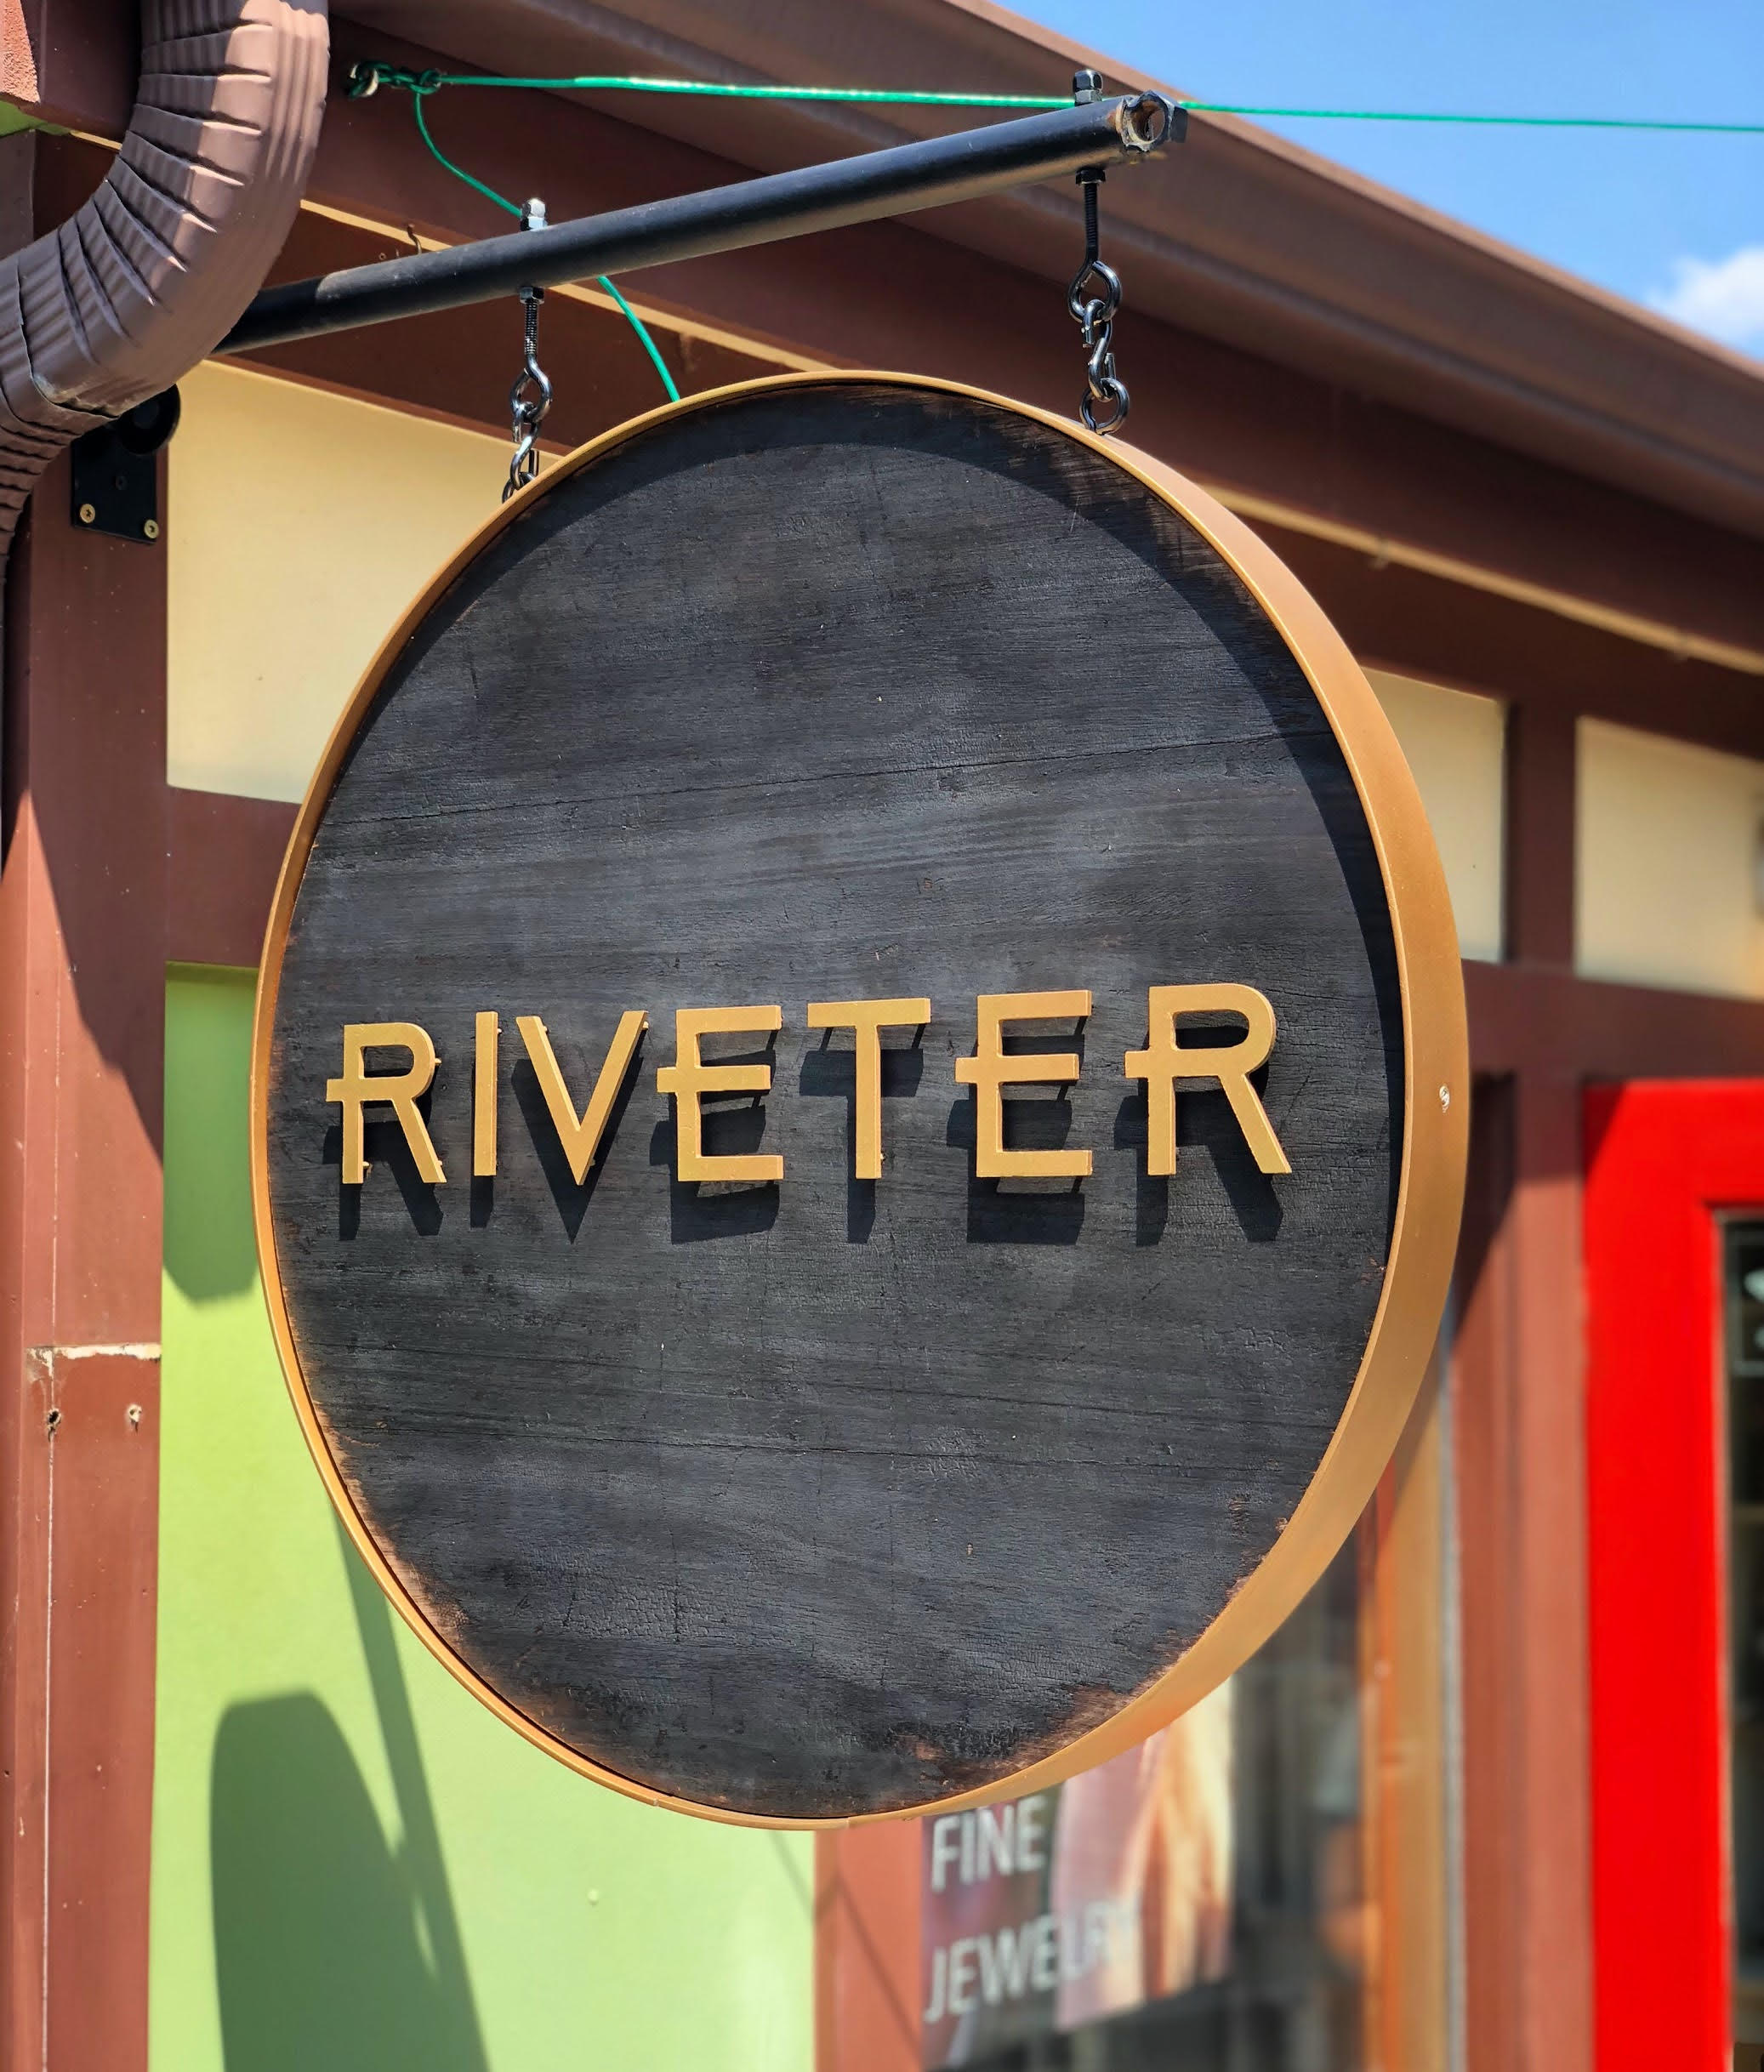 "Riveter    East Nashville, Tn  24"" x 24""  Charred Eucalyptus, Aluminum, Gold Flake, Double Sided"